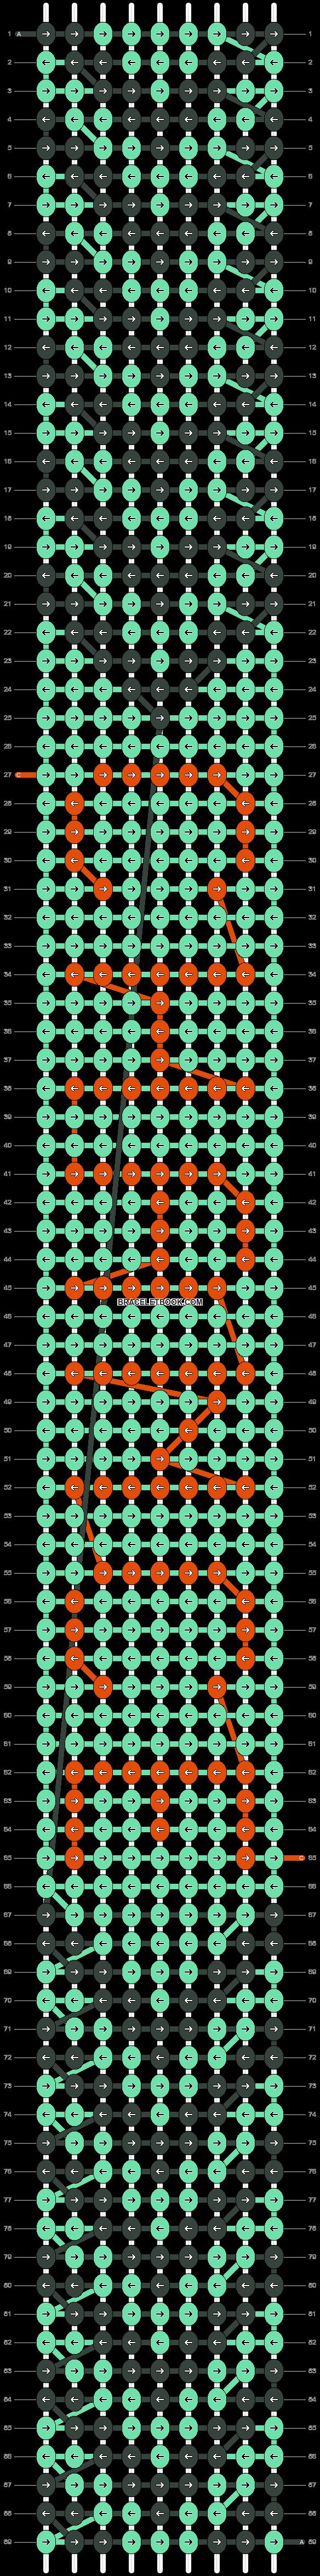 Alpha pattern #18283 pattern